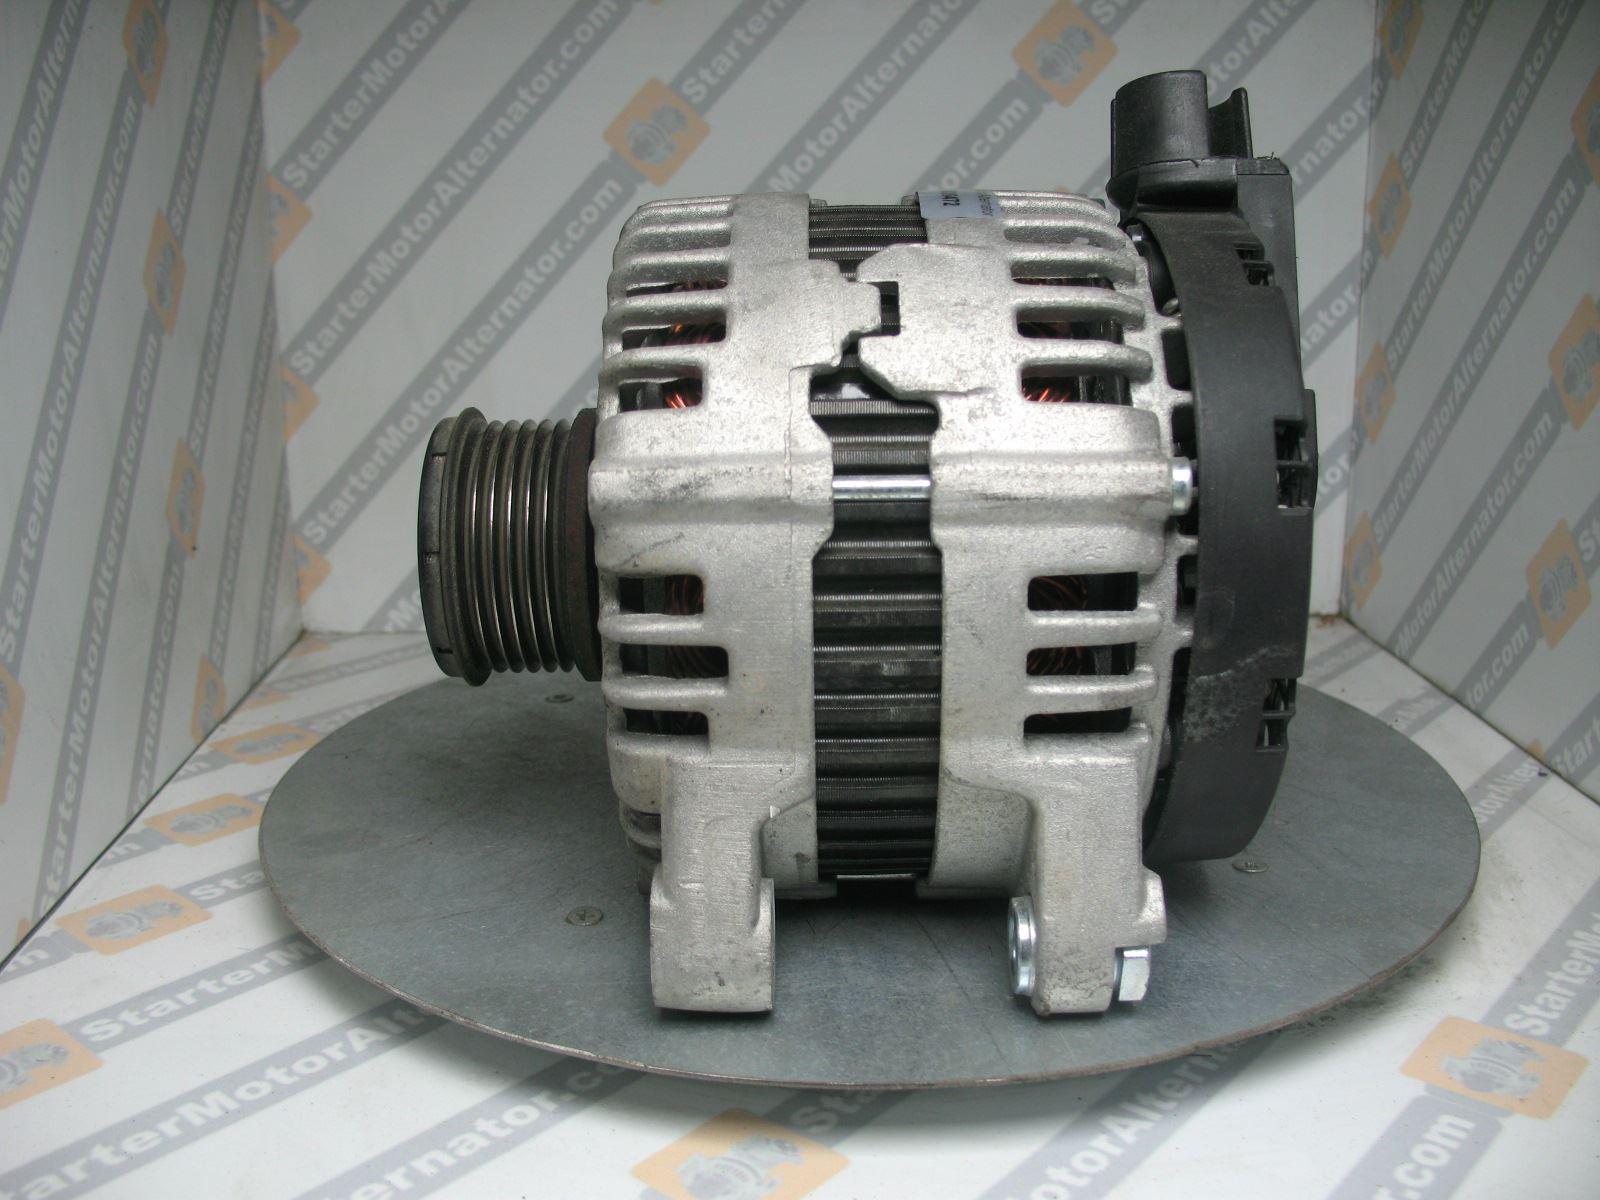 XIK2973 Alternator For Ford / Land Rover